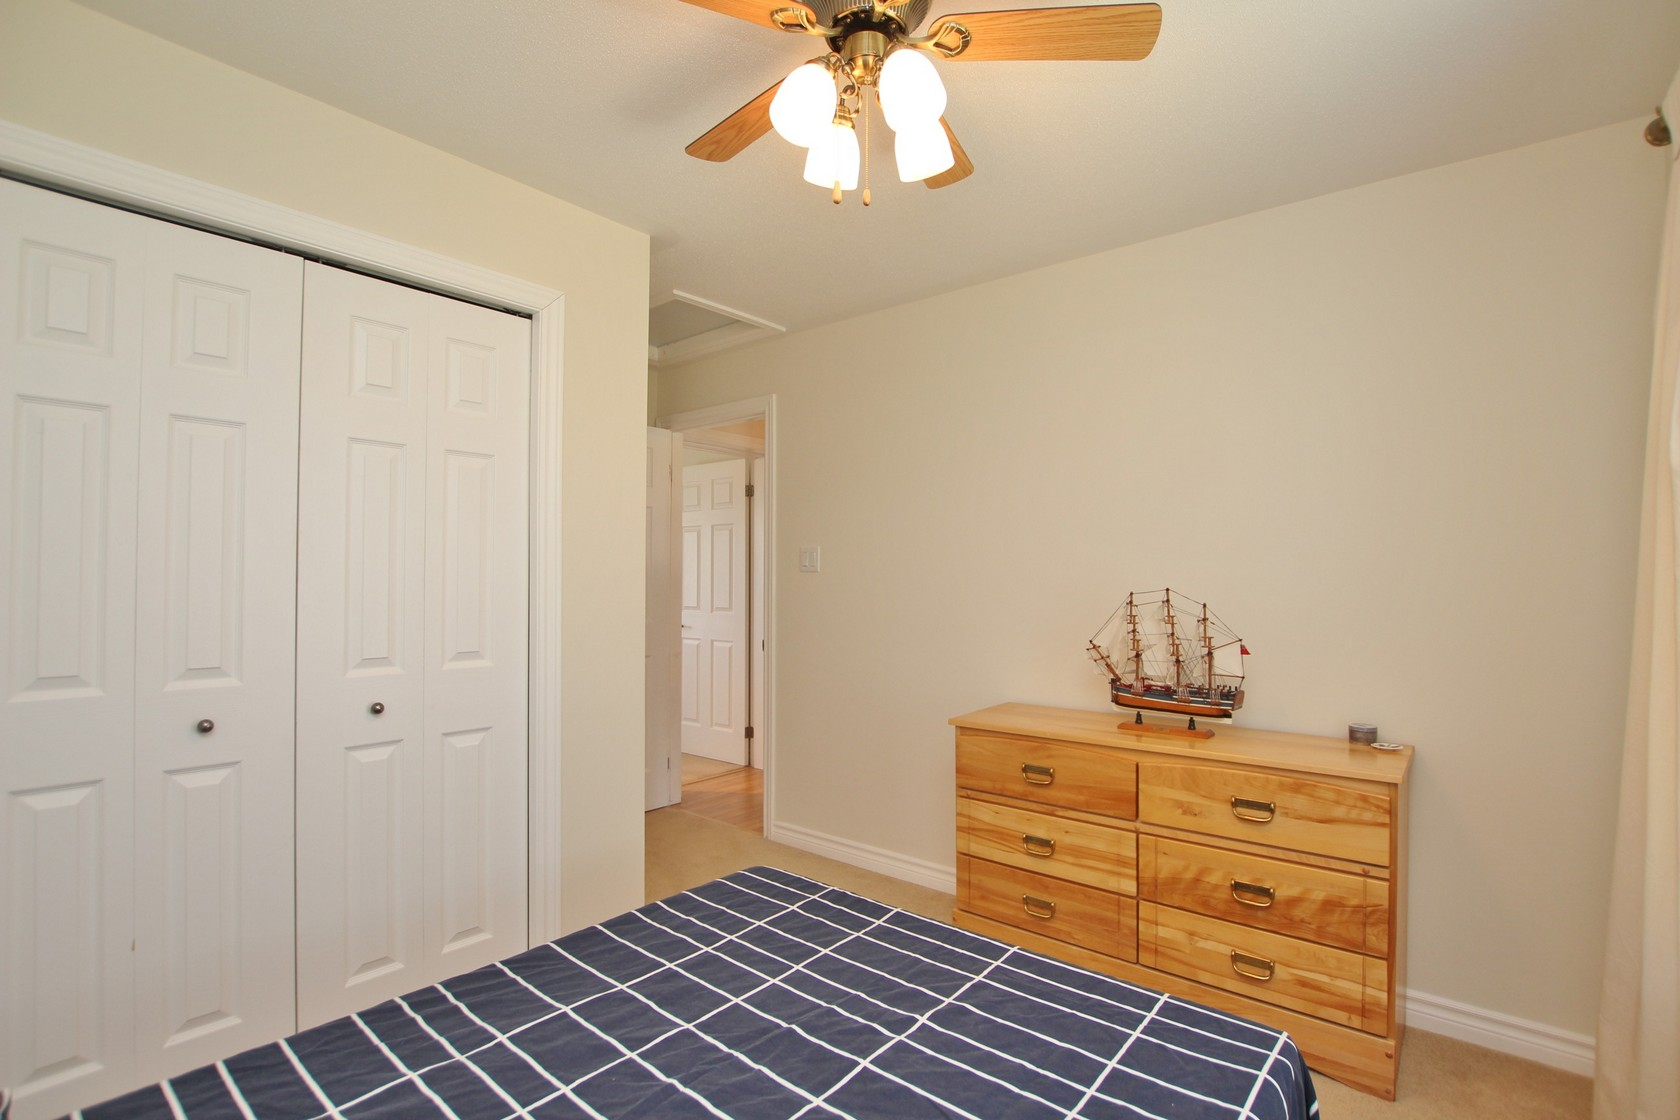 6306 ottawa street homes by hartman address 6306 ottawa street aloadofball Gallery